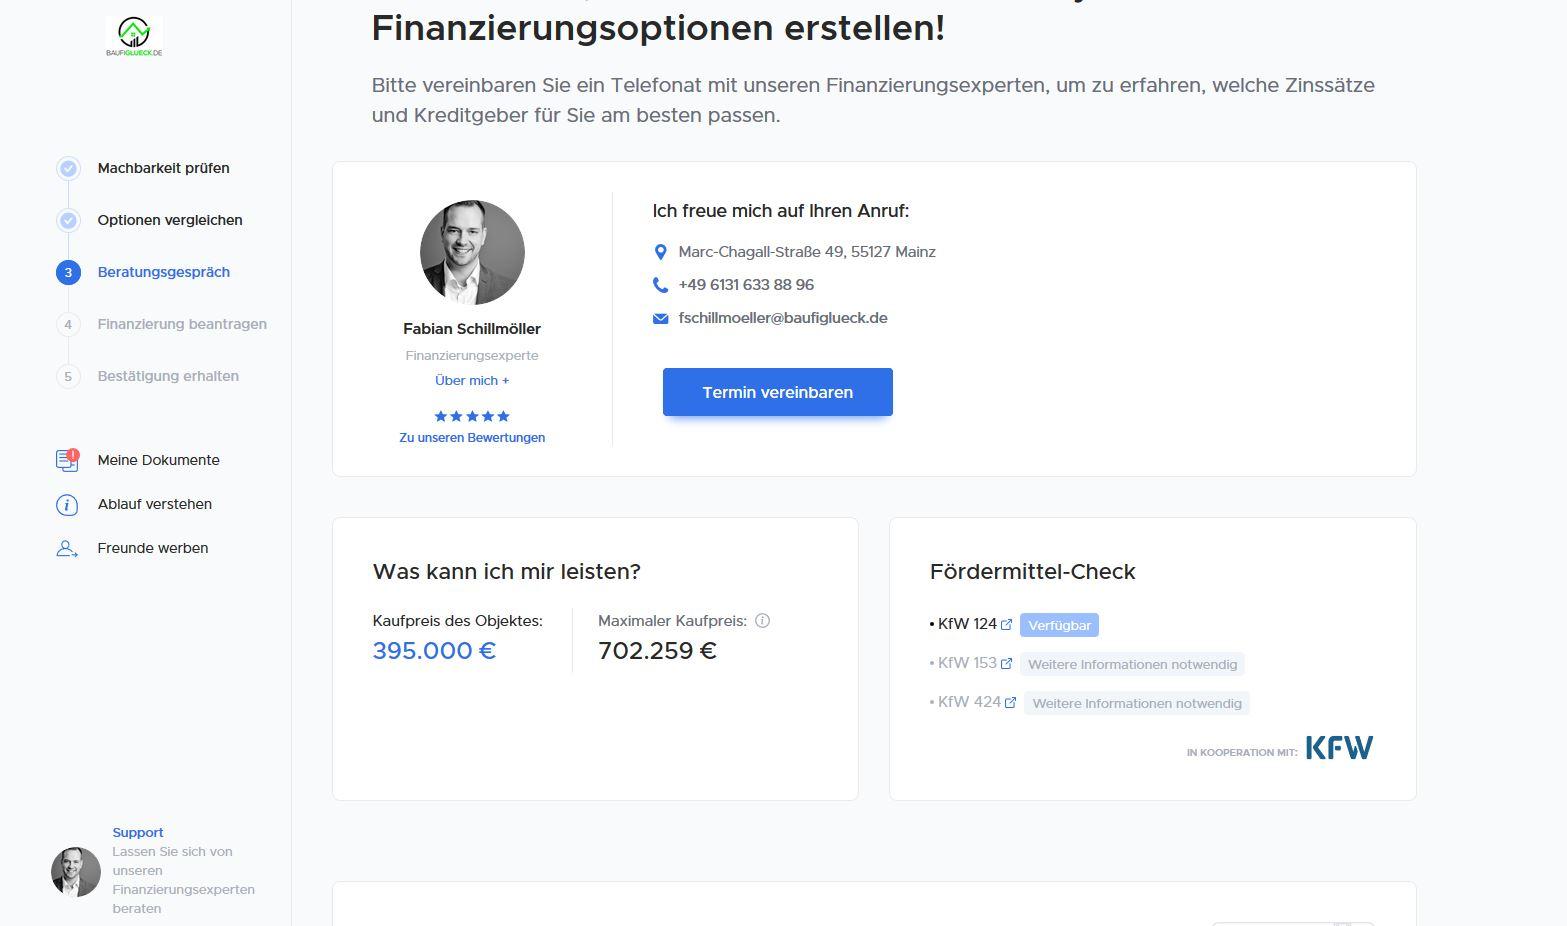 Kundenportal Baufiglueck.de